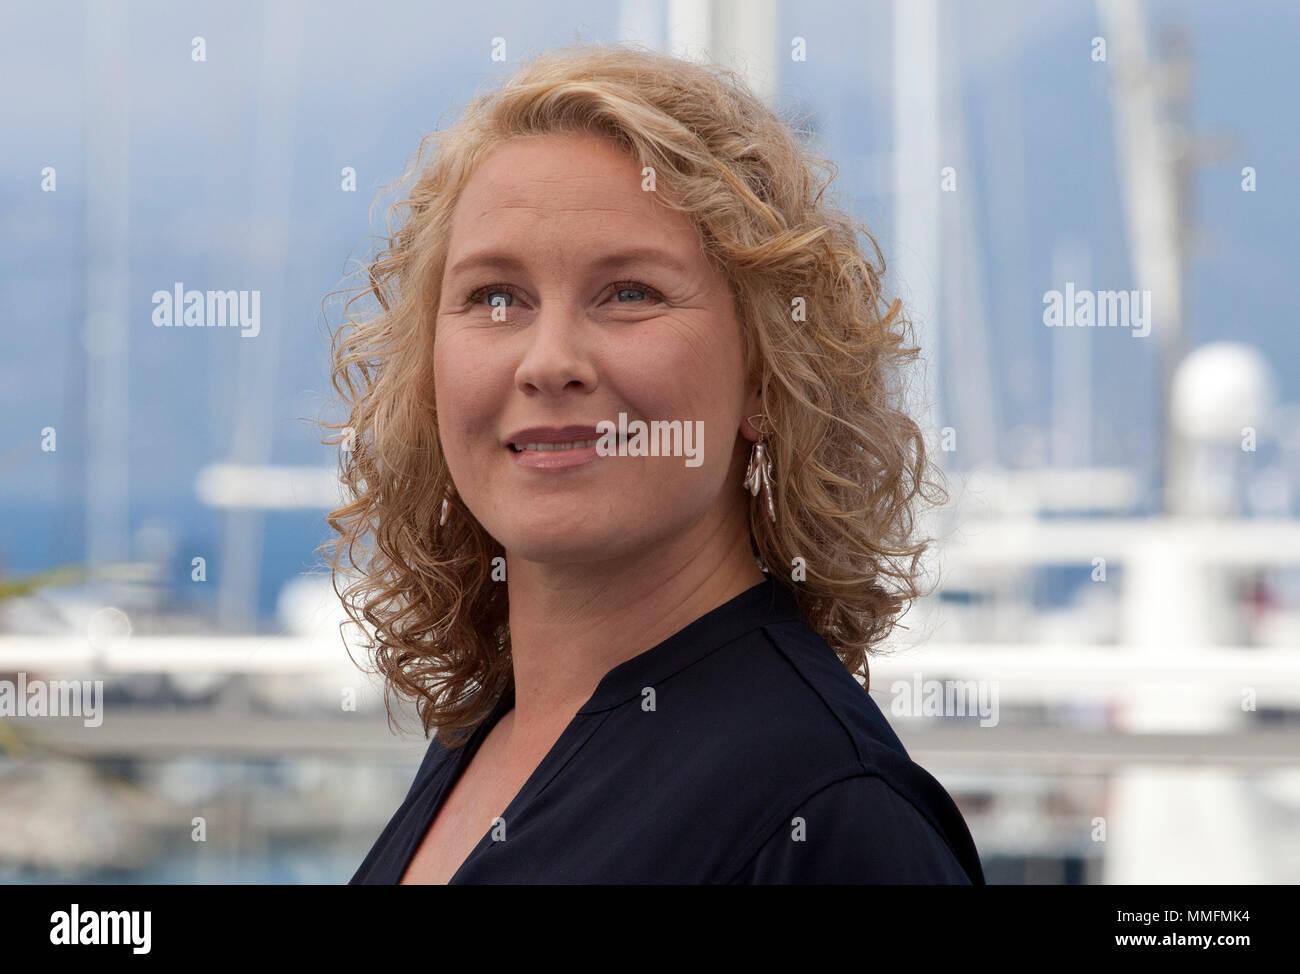 Actress Eva Melander At The Grans Border Film Photo Call 71st Cannes Festival Friday 11th May 2018 France